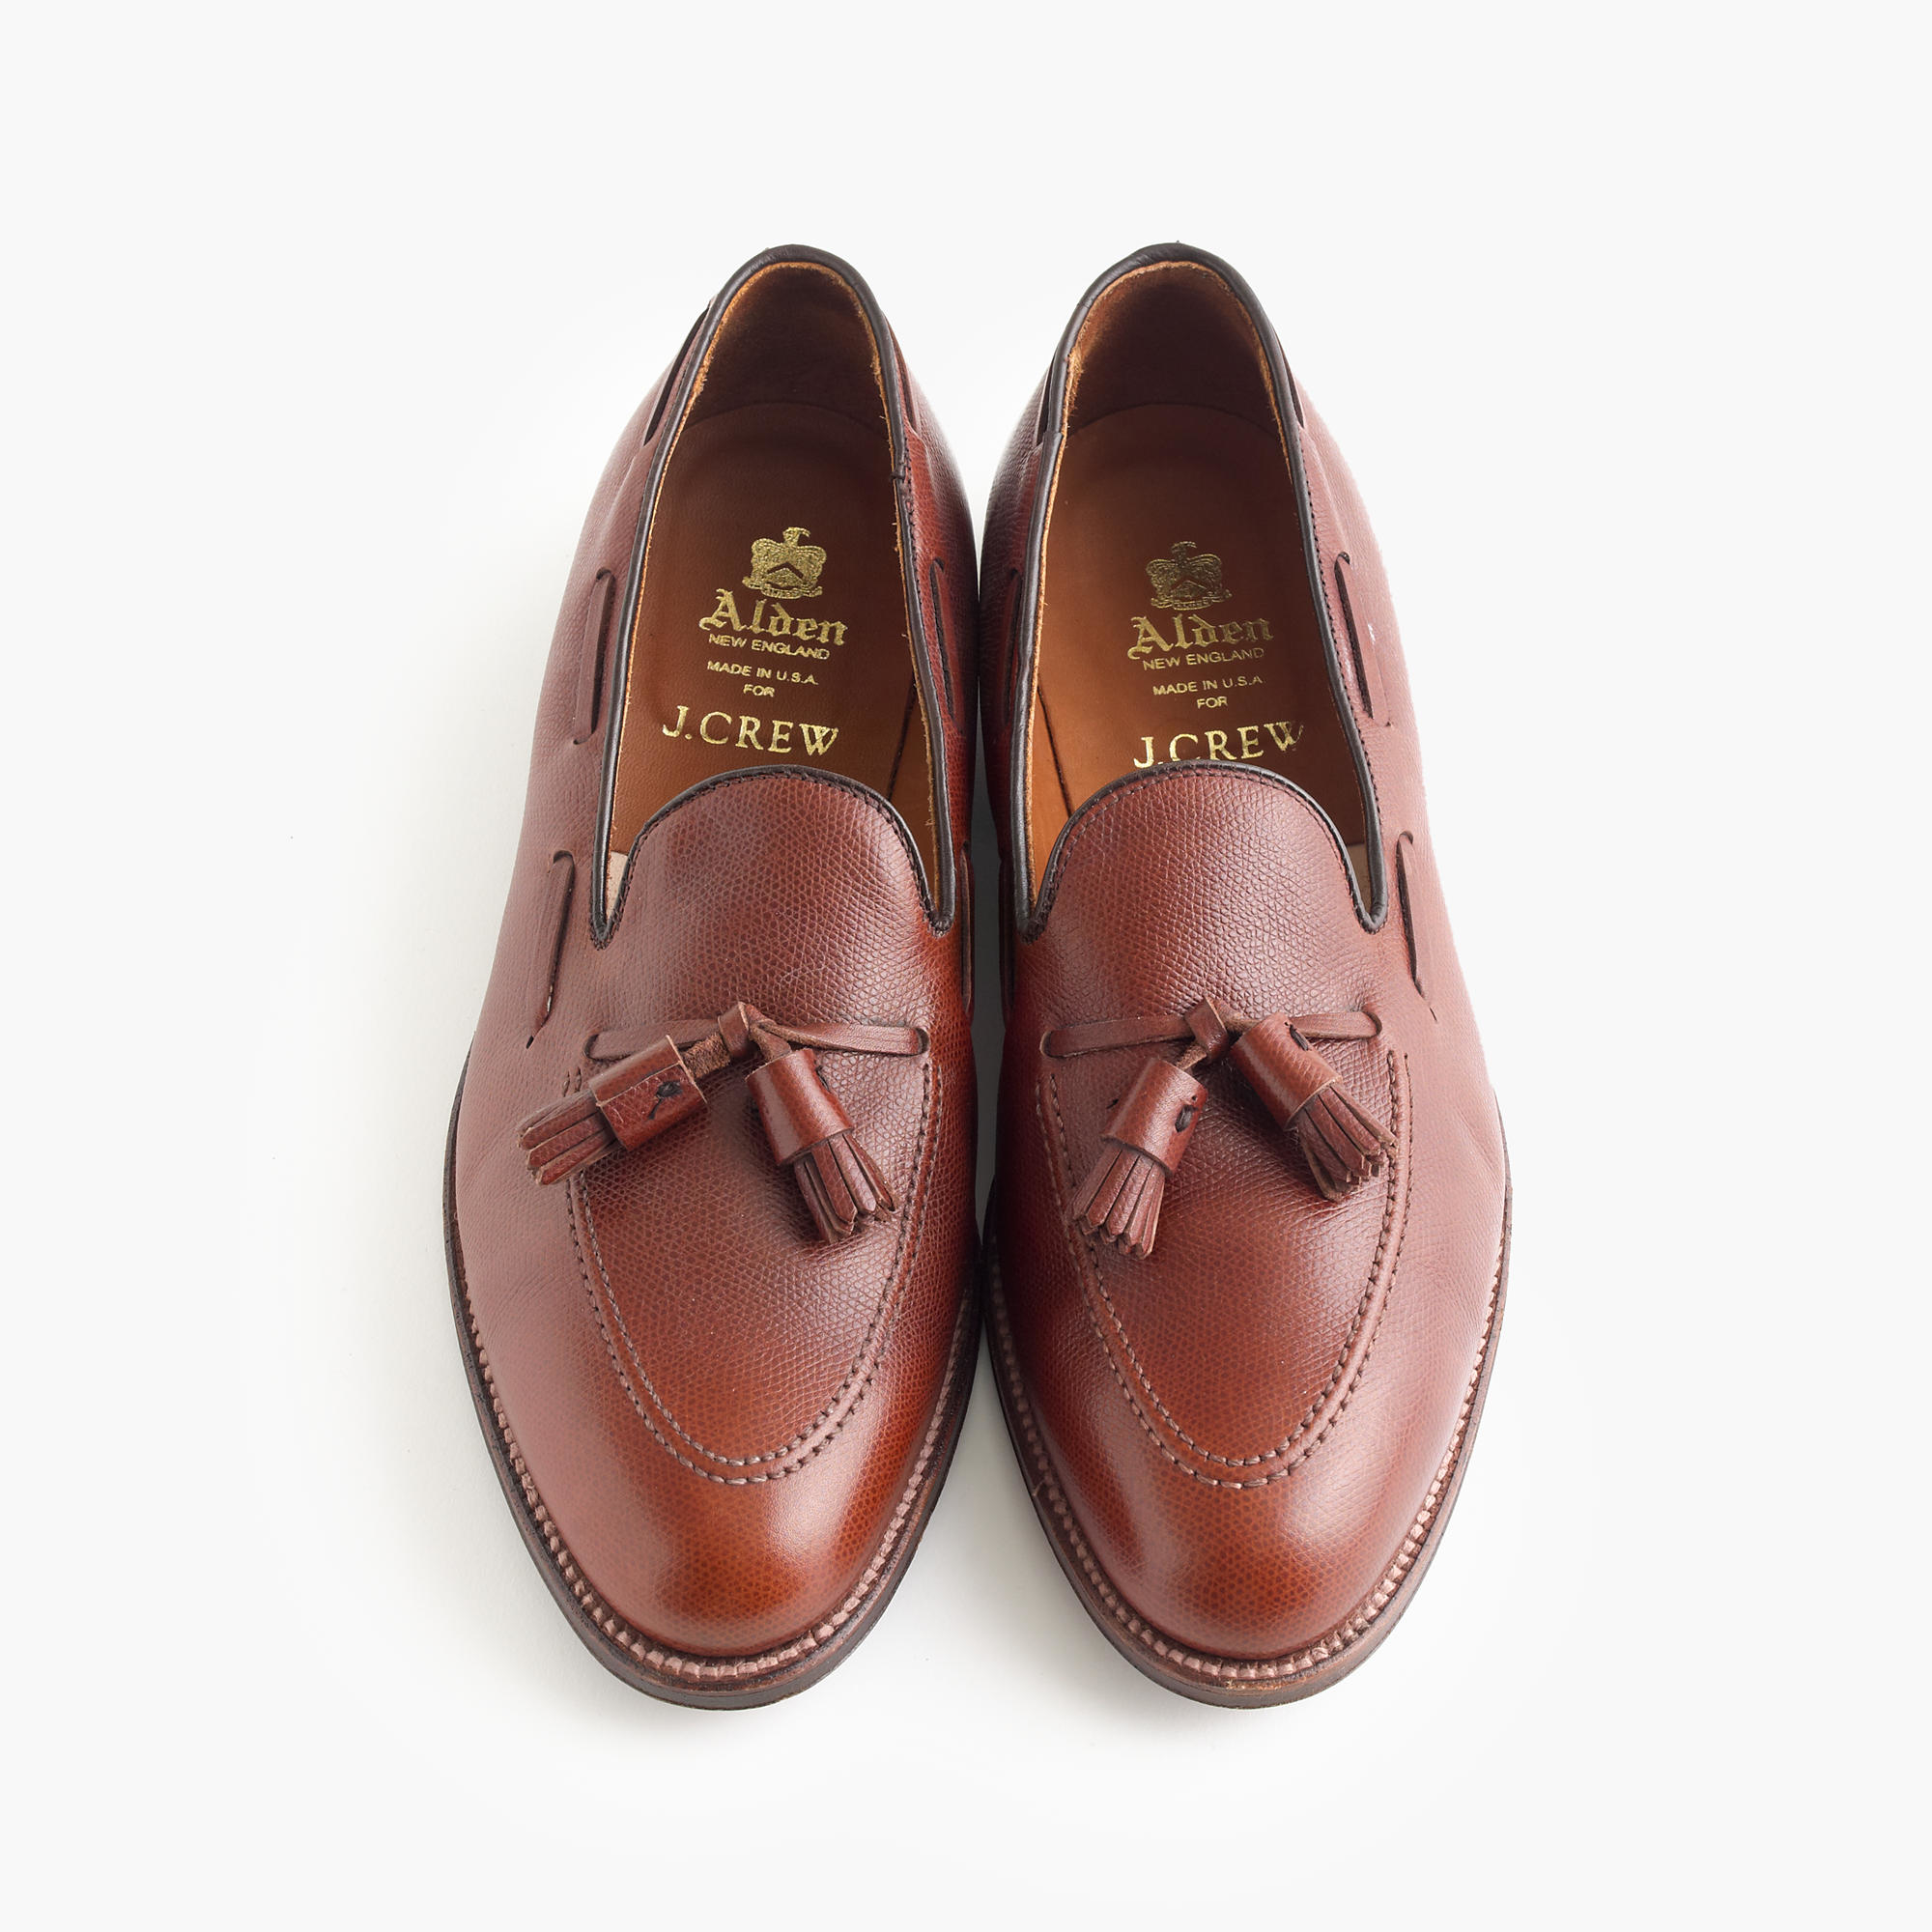 Alden Leather Shoes